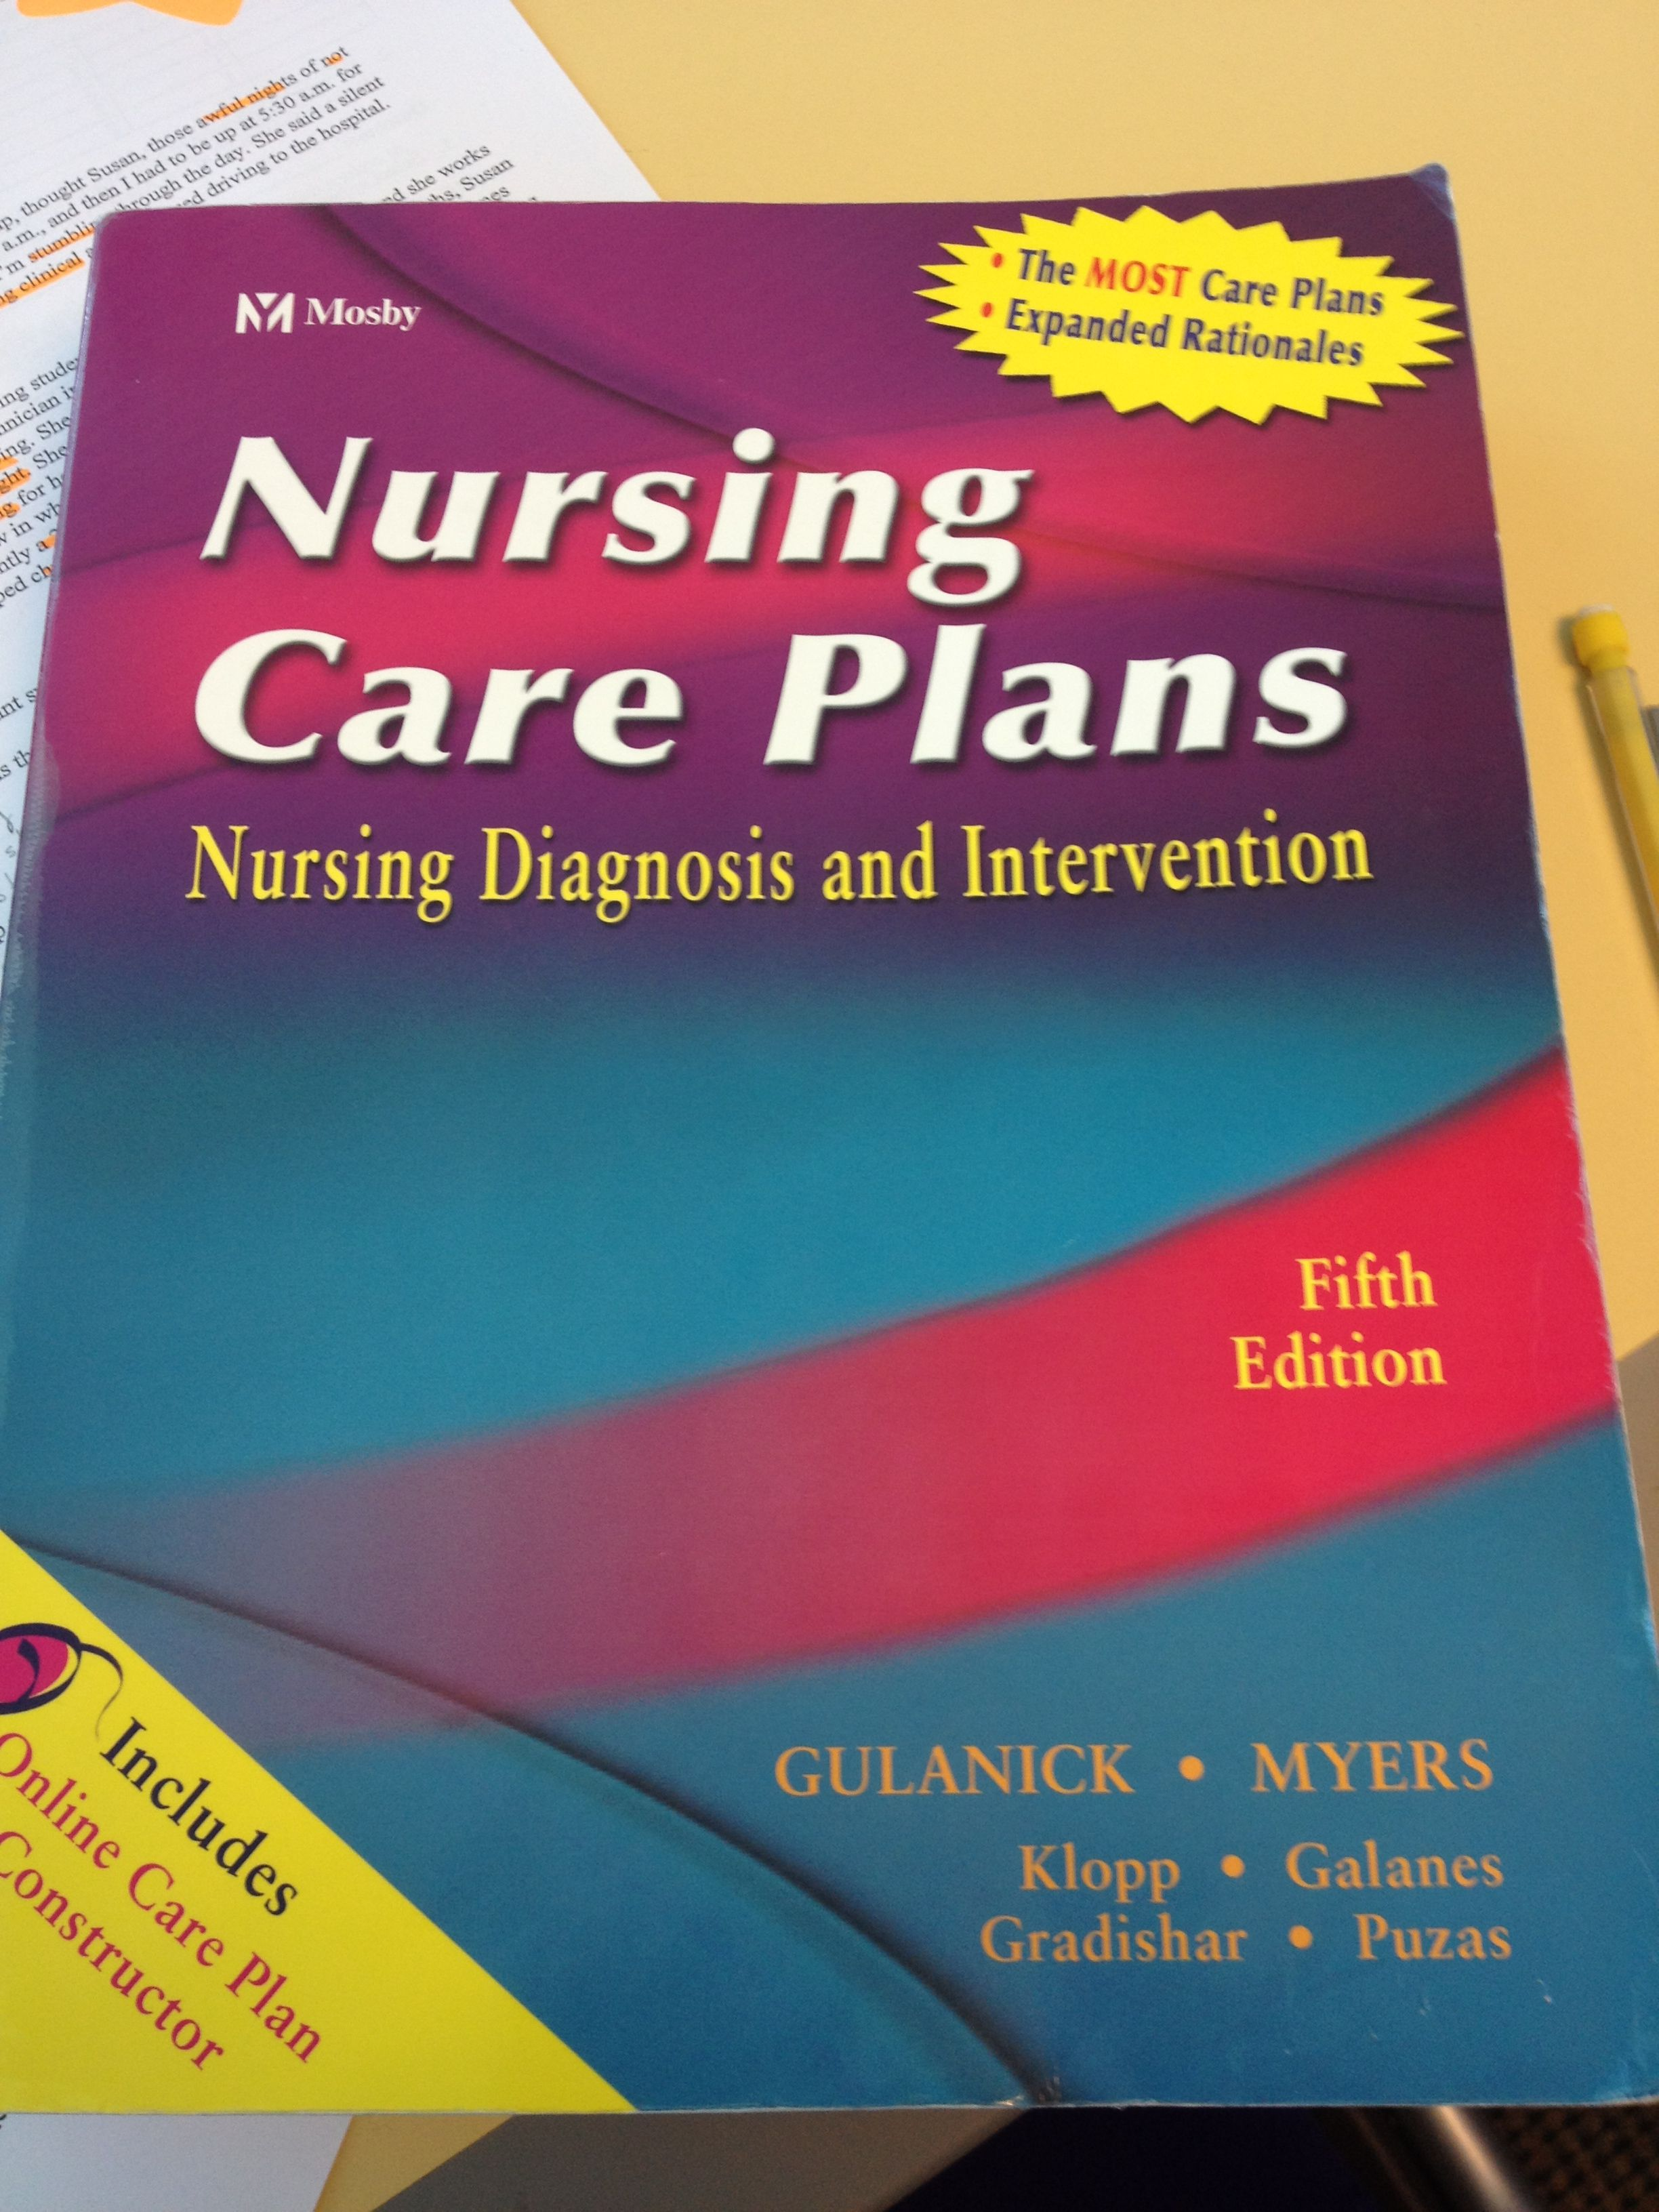 Mosbys nursing care plans nursing diagnosis intervention a mosbys nursing care plans nursing diagnosis intervention a common book for nursing clinicals fandeluxe Image collections